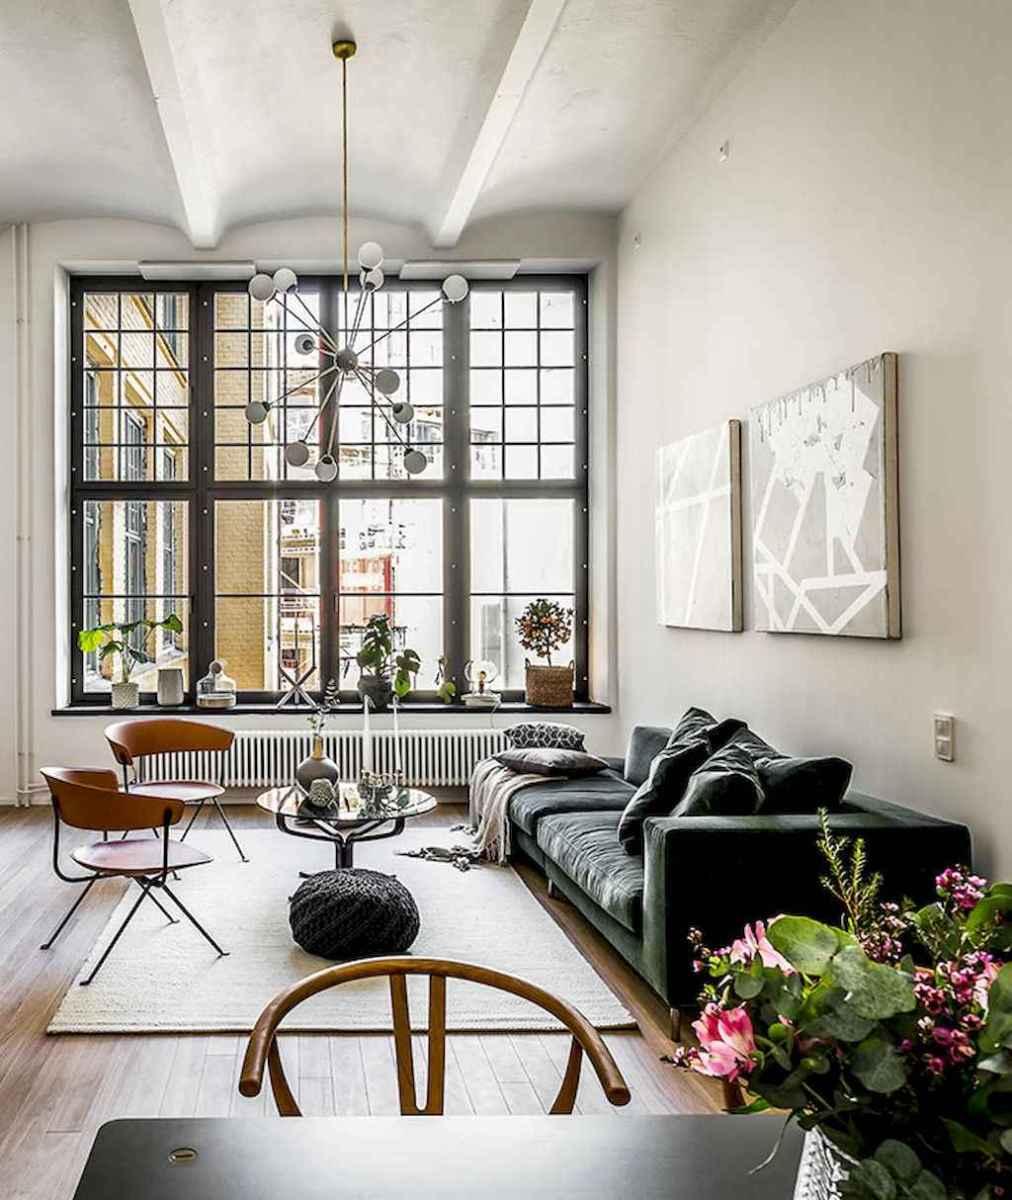 Stylish scandinavian style apartment decor ideas (4)